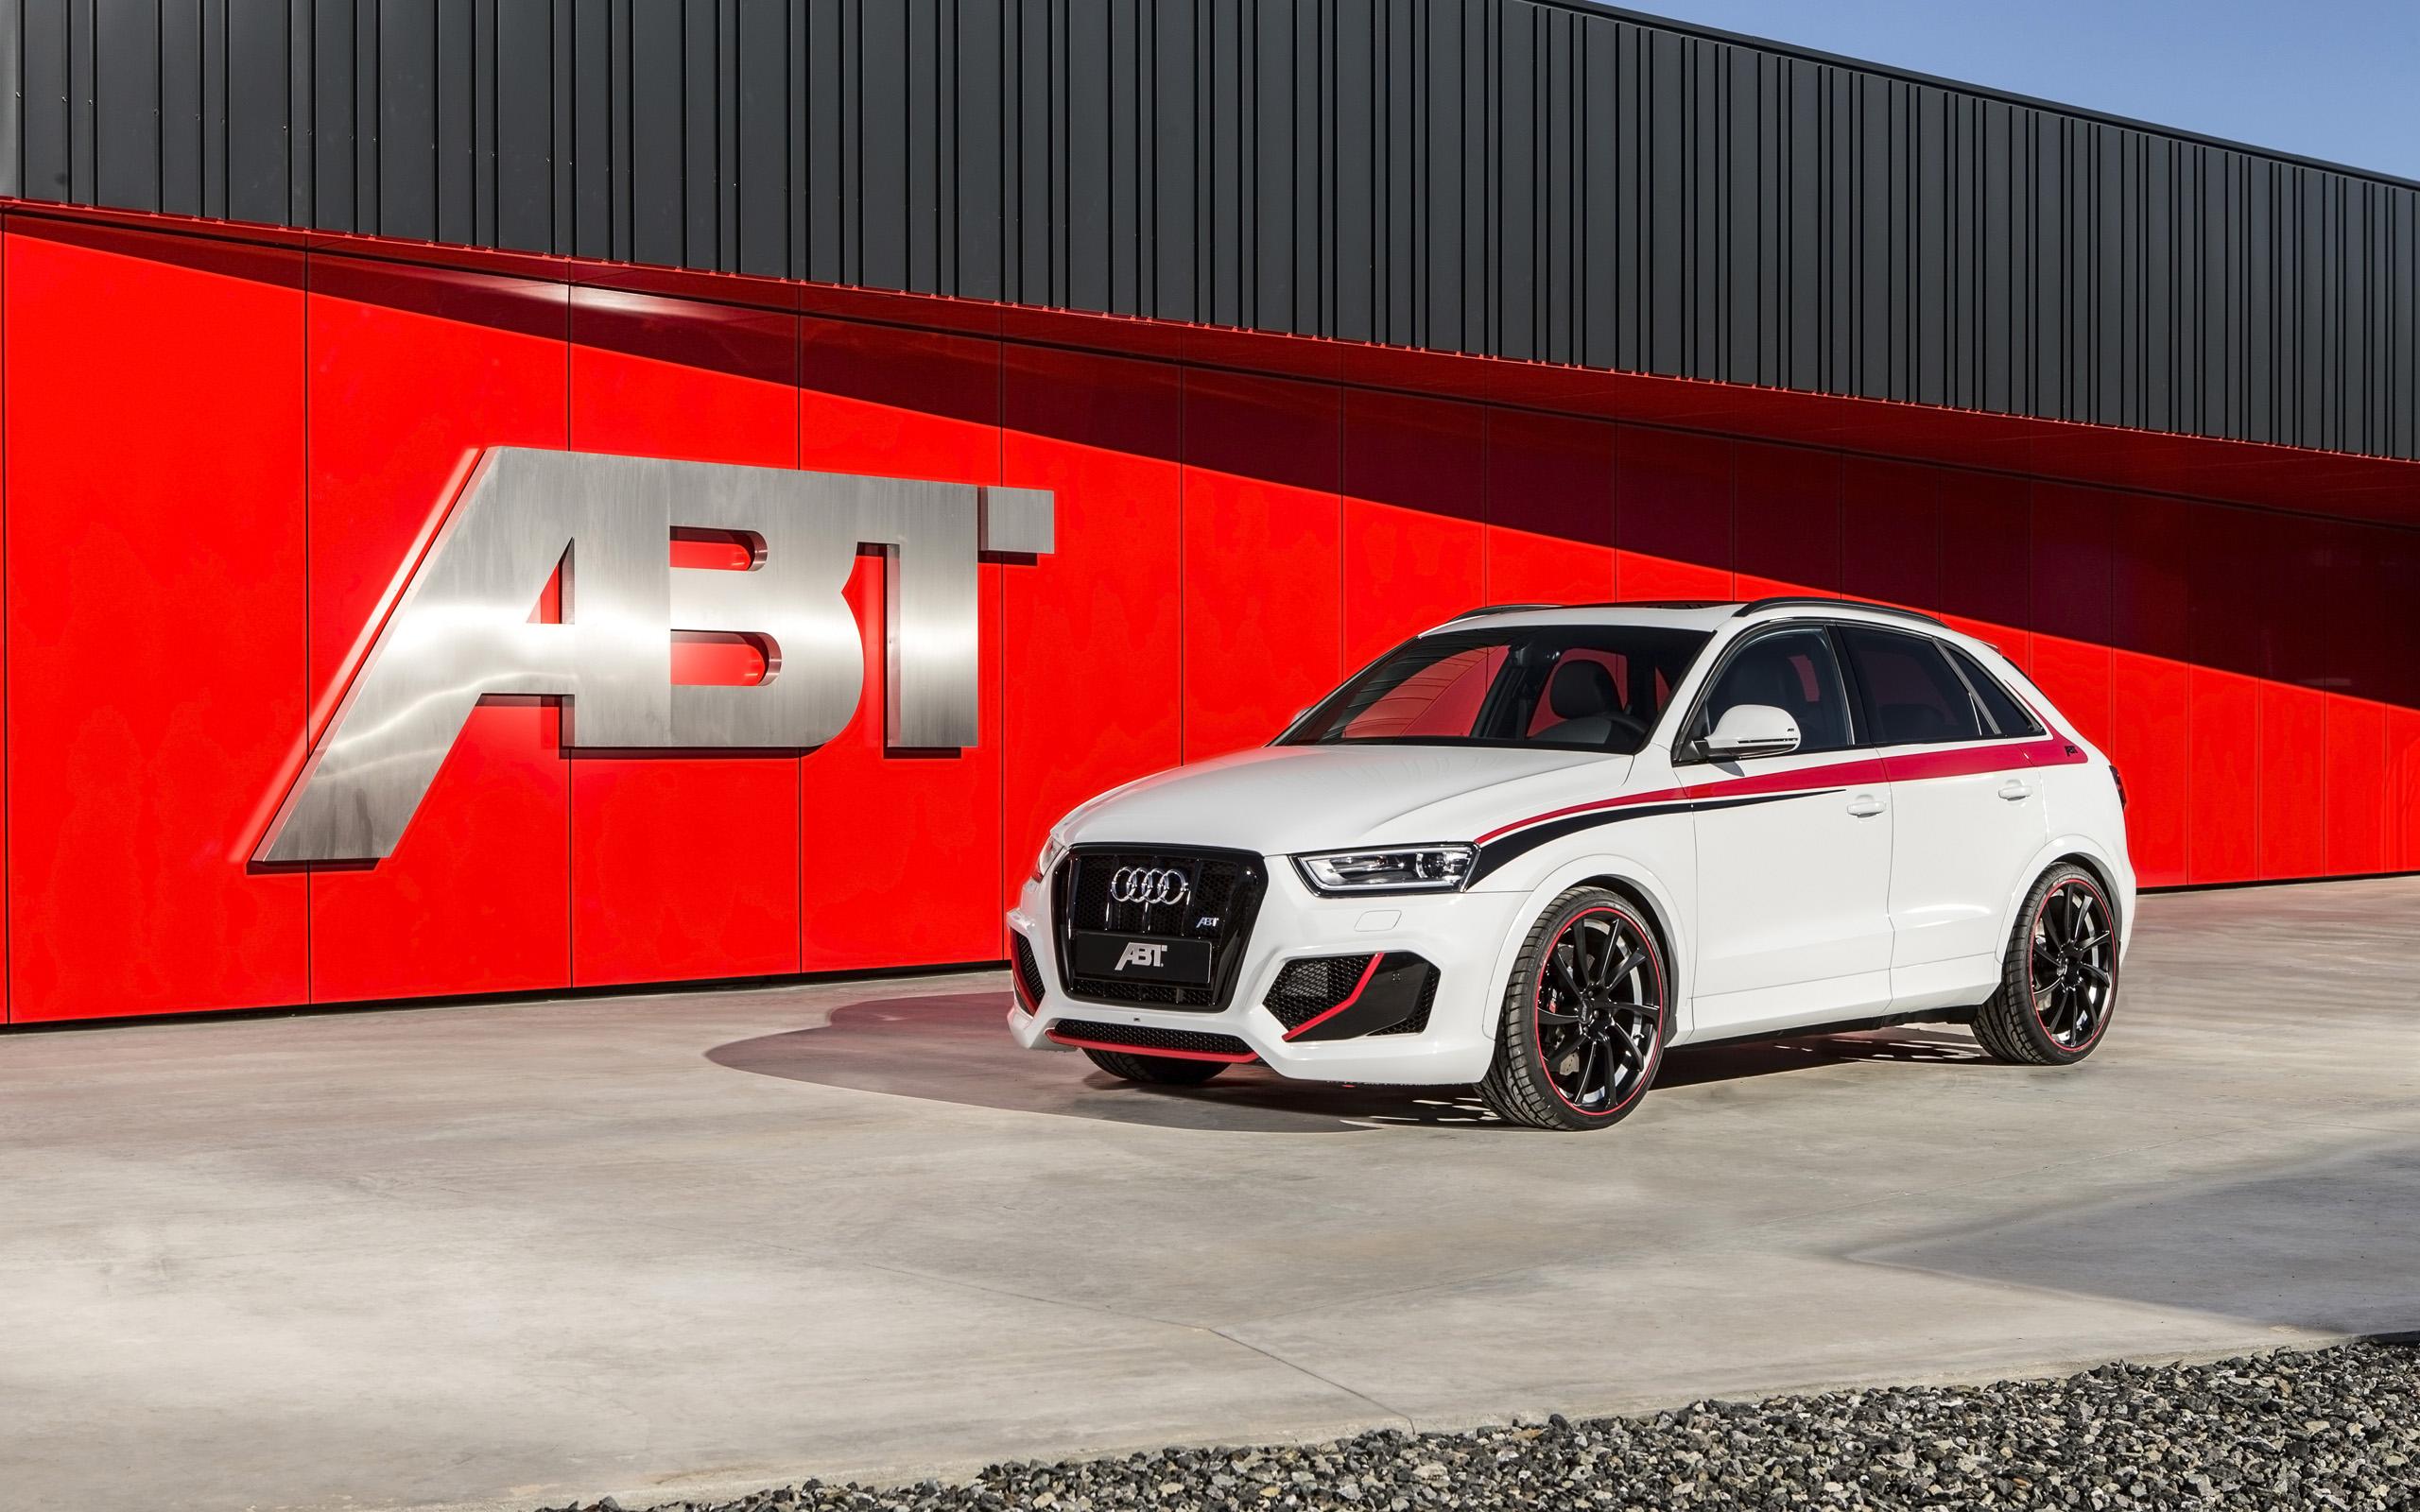 Ultra Hd Wallpapers 8k Cars Pack 2014 Abt Audi Rs Q3 Wallpaper Hd Car Wallpapers Id 4671